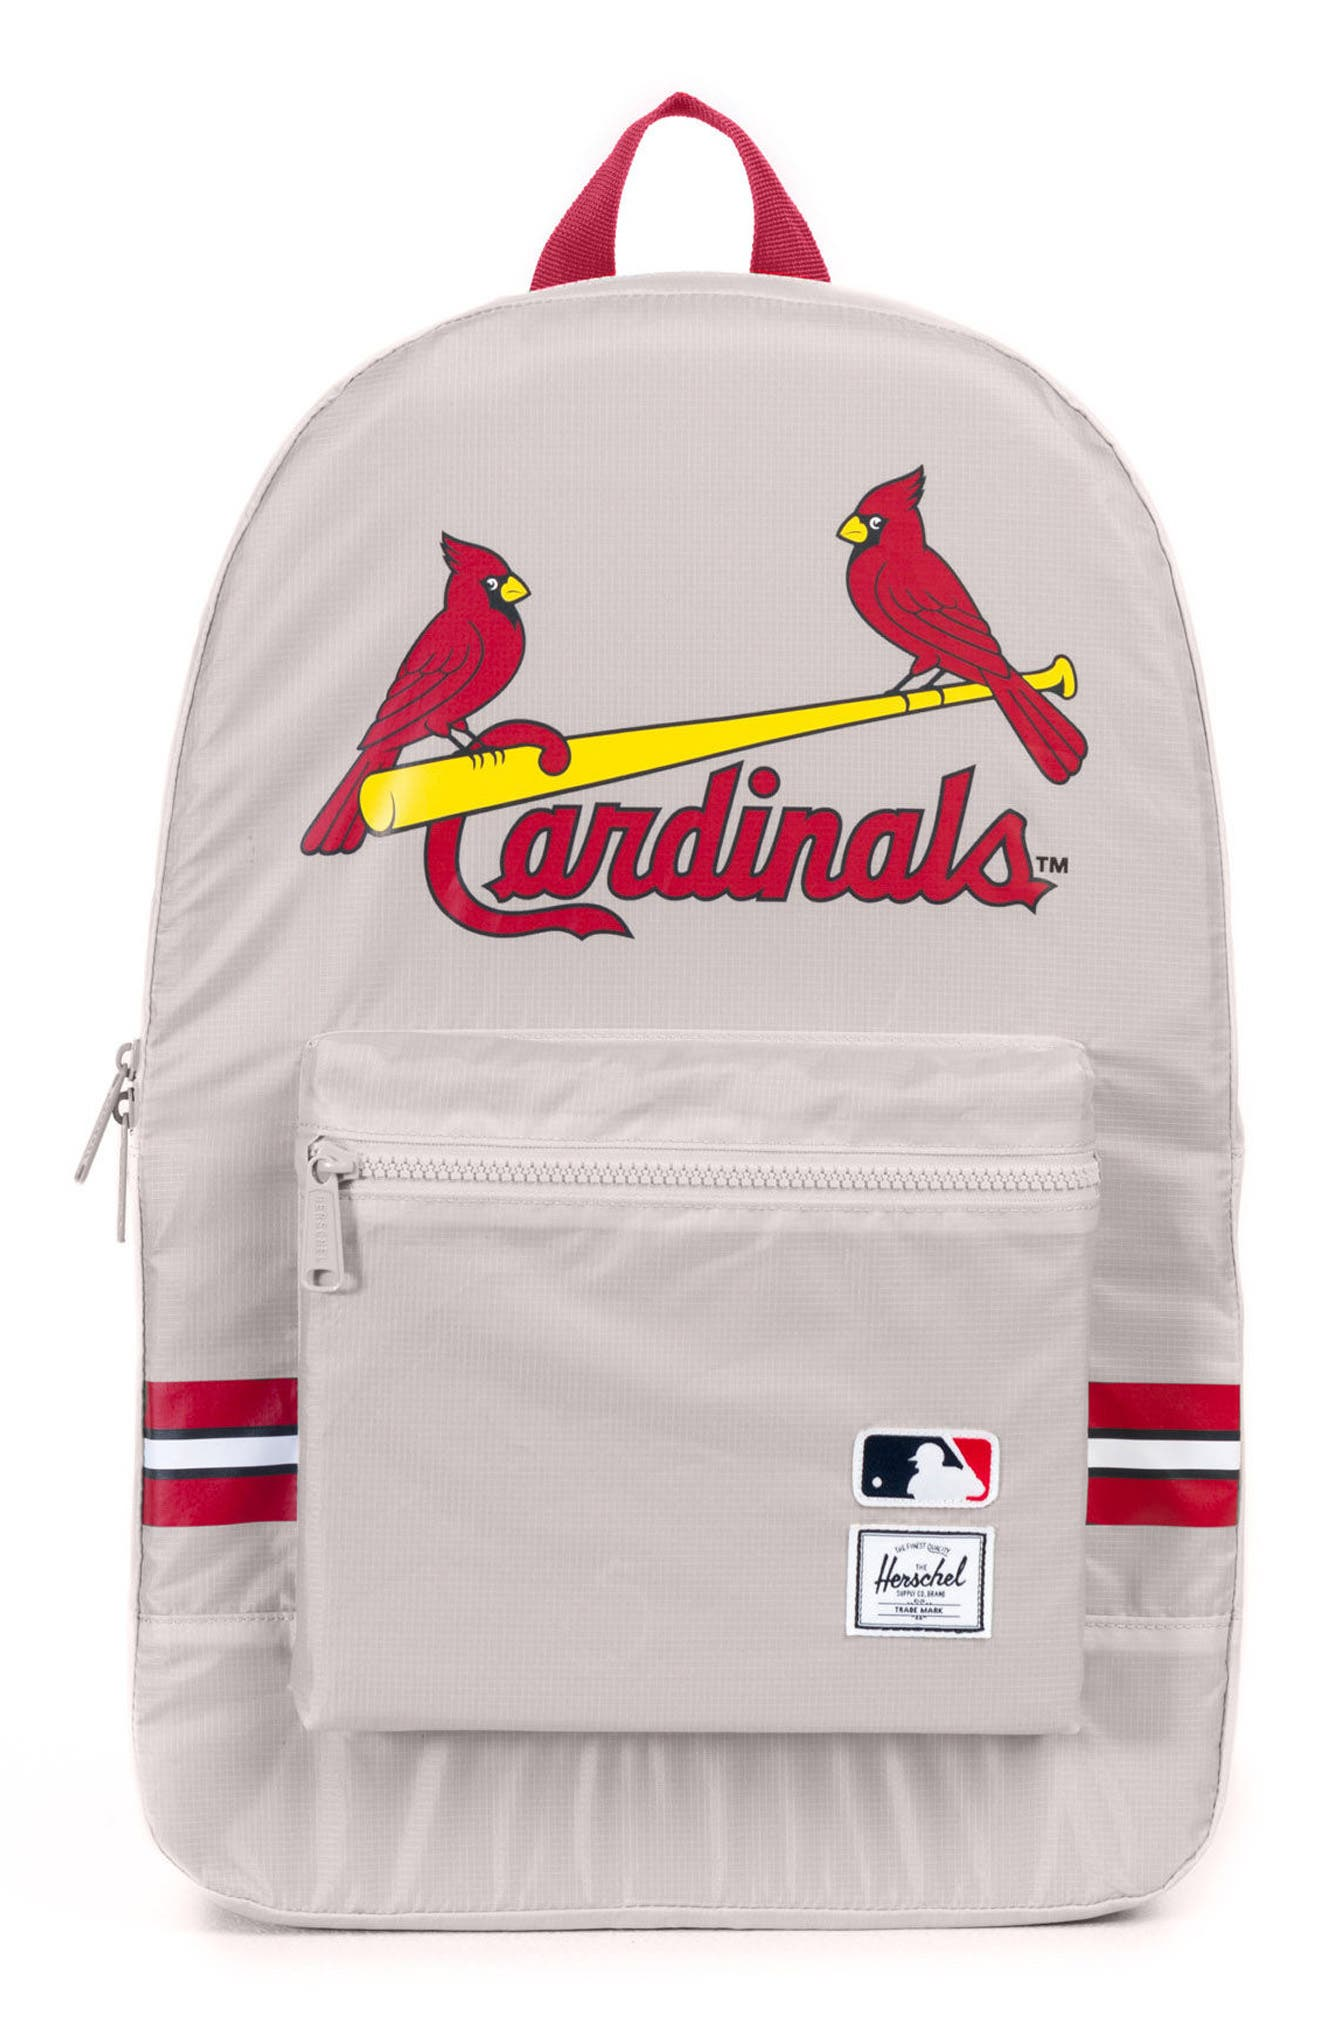 Packable - MLB National League Backpack,                         Main,                         color, ST LOUIS CARDINALS